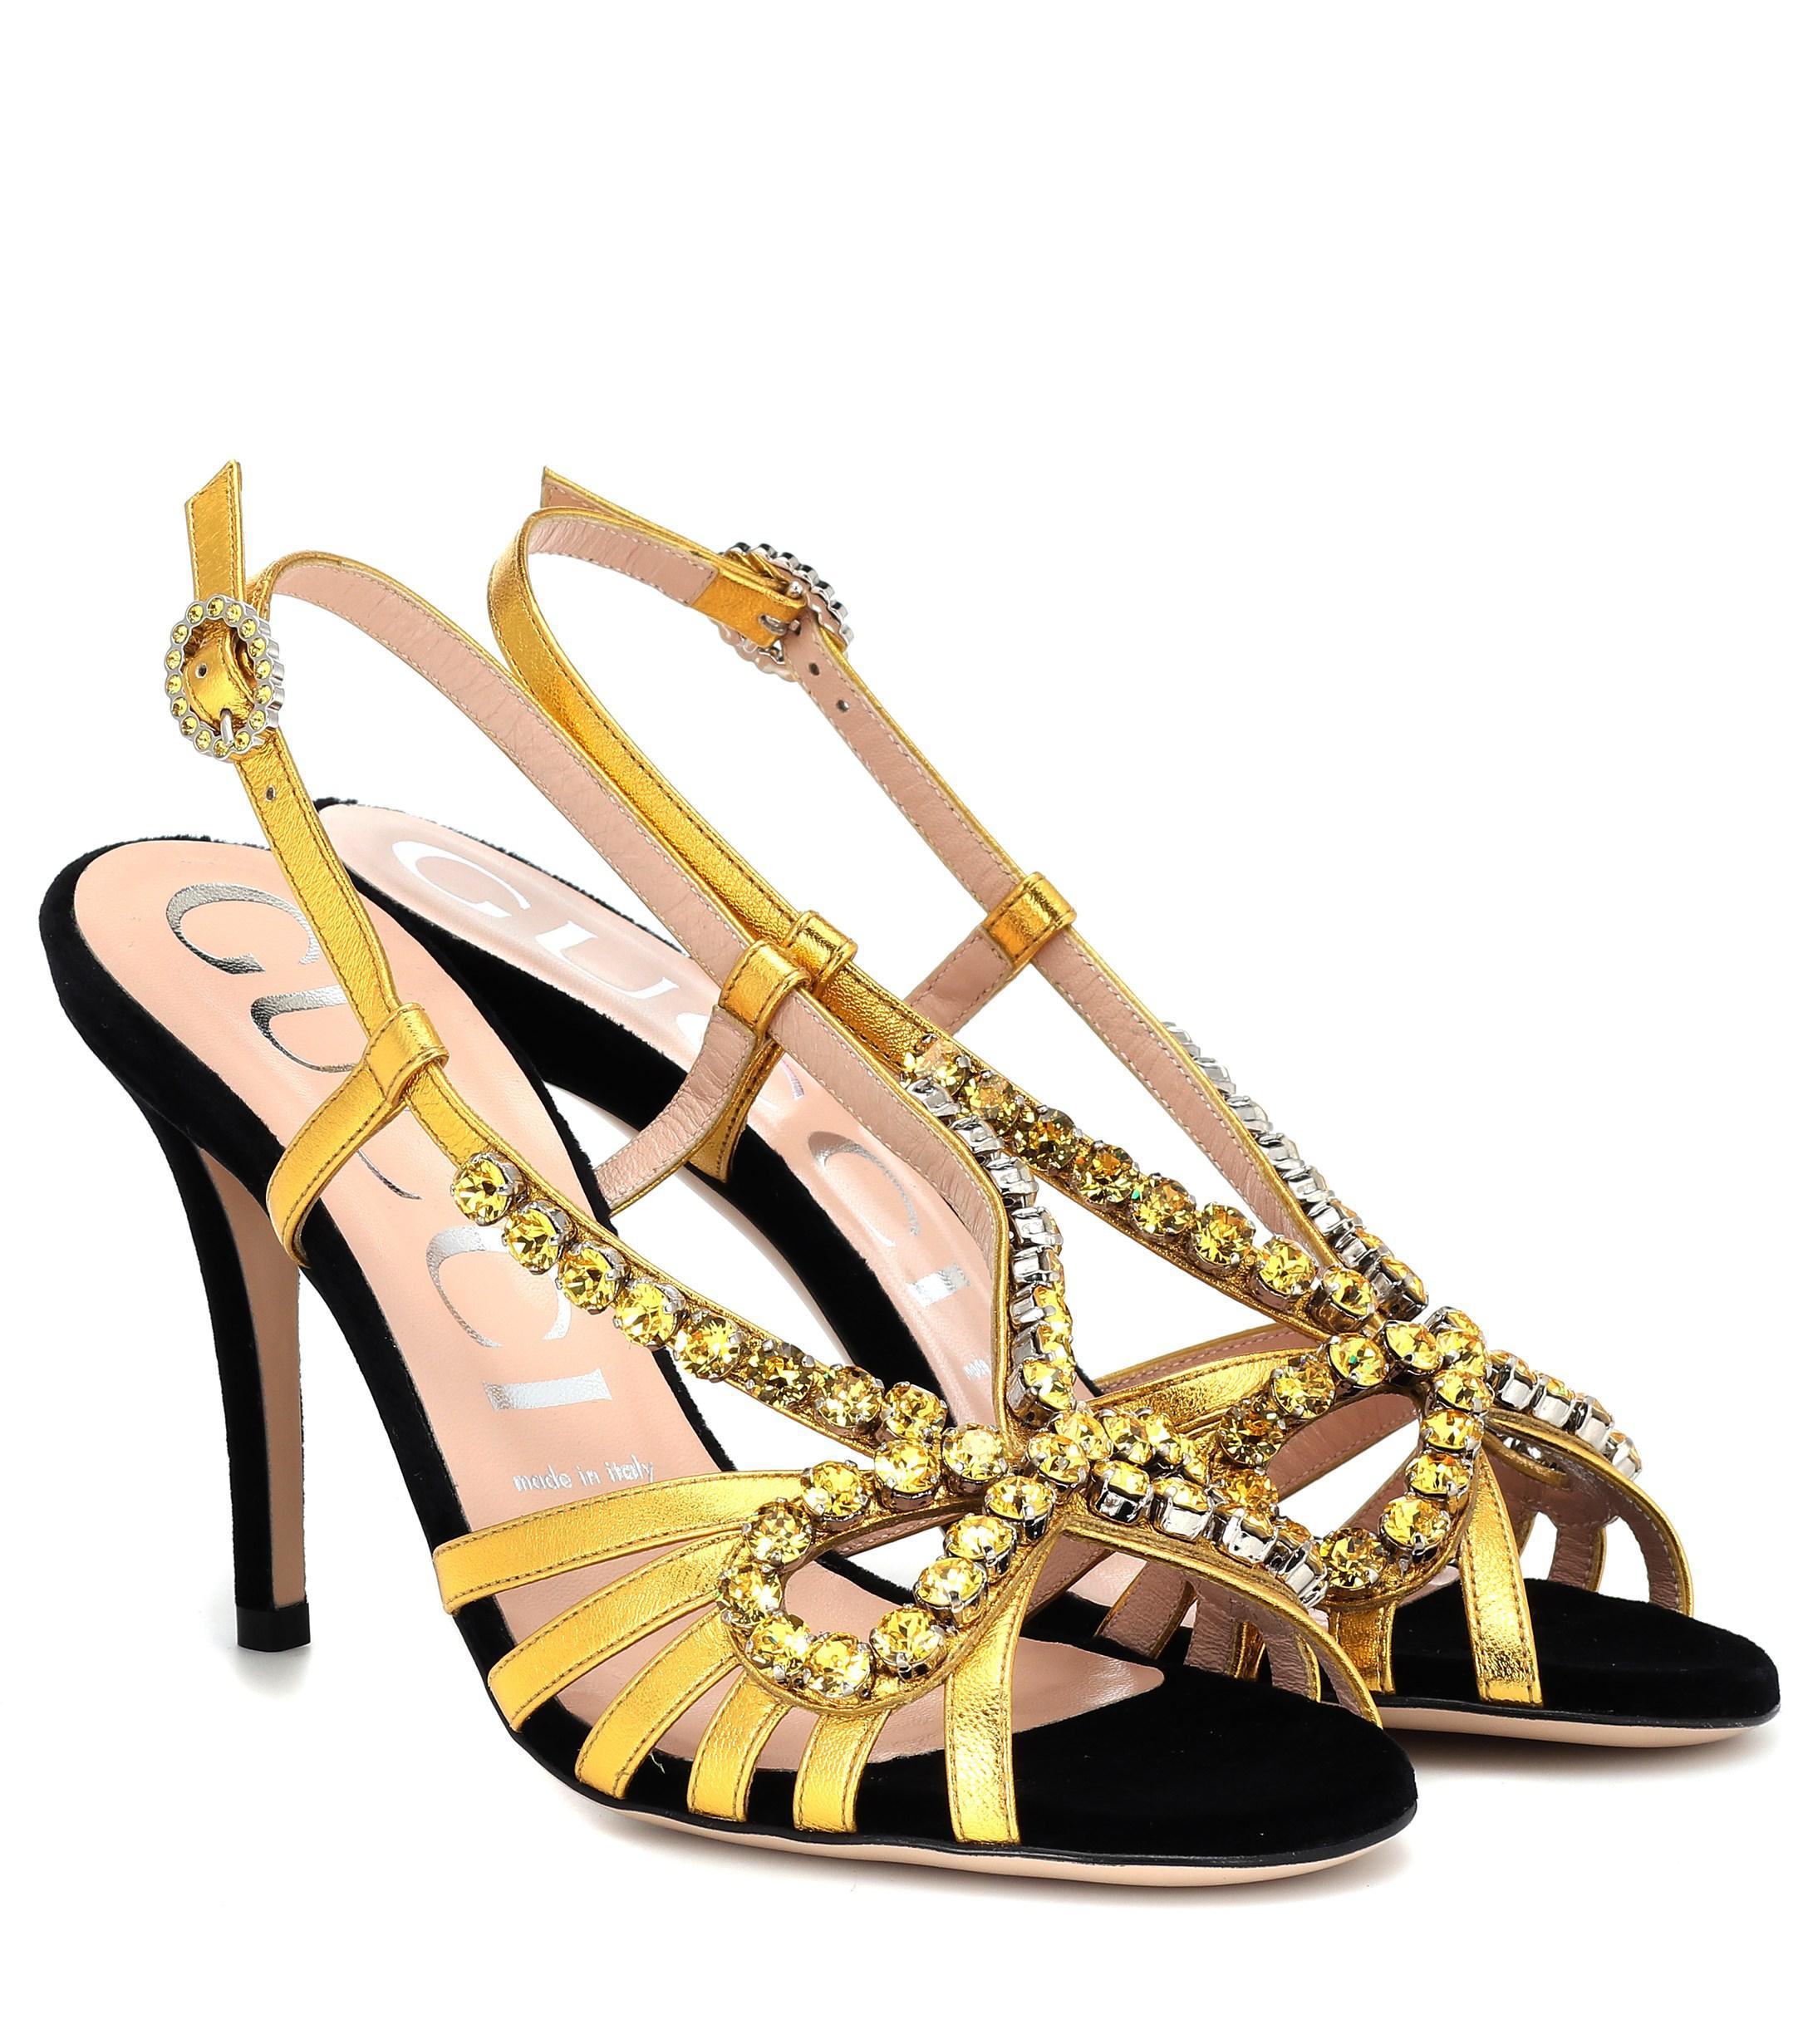 7b0d288b7152 Lyst - Gucci Embellished Metallic Leather Sandals in Metallic